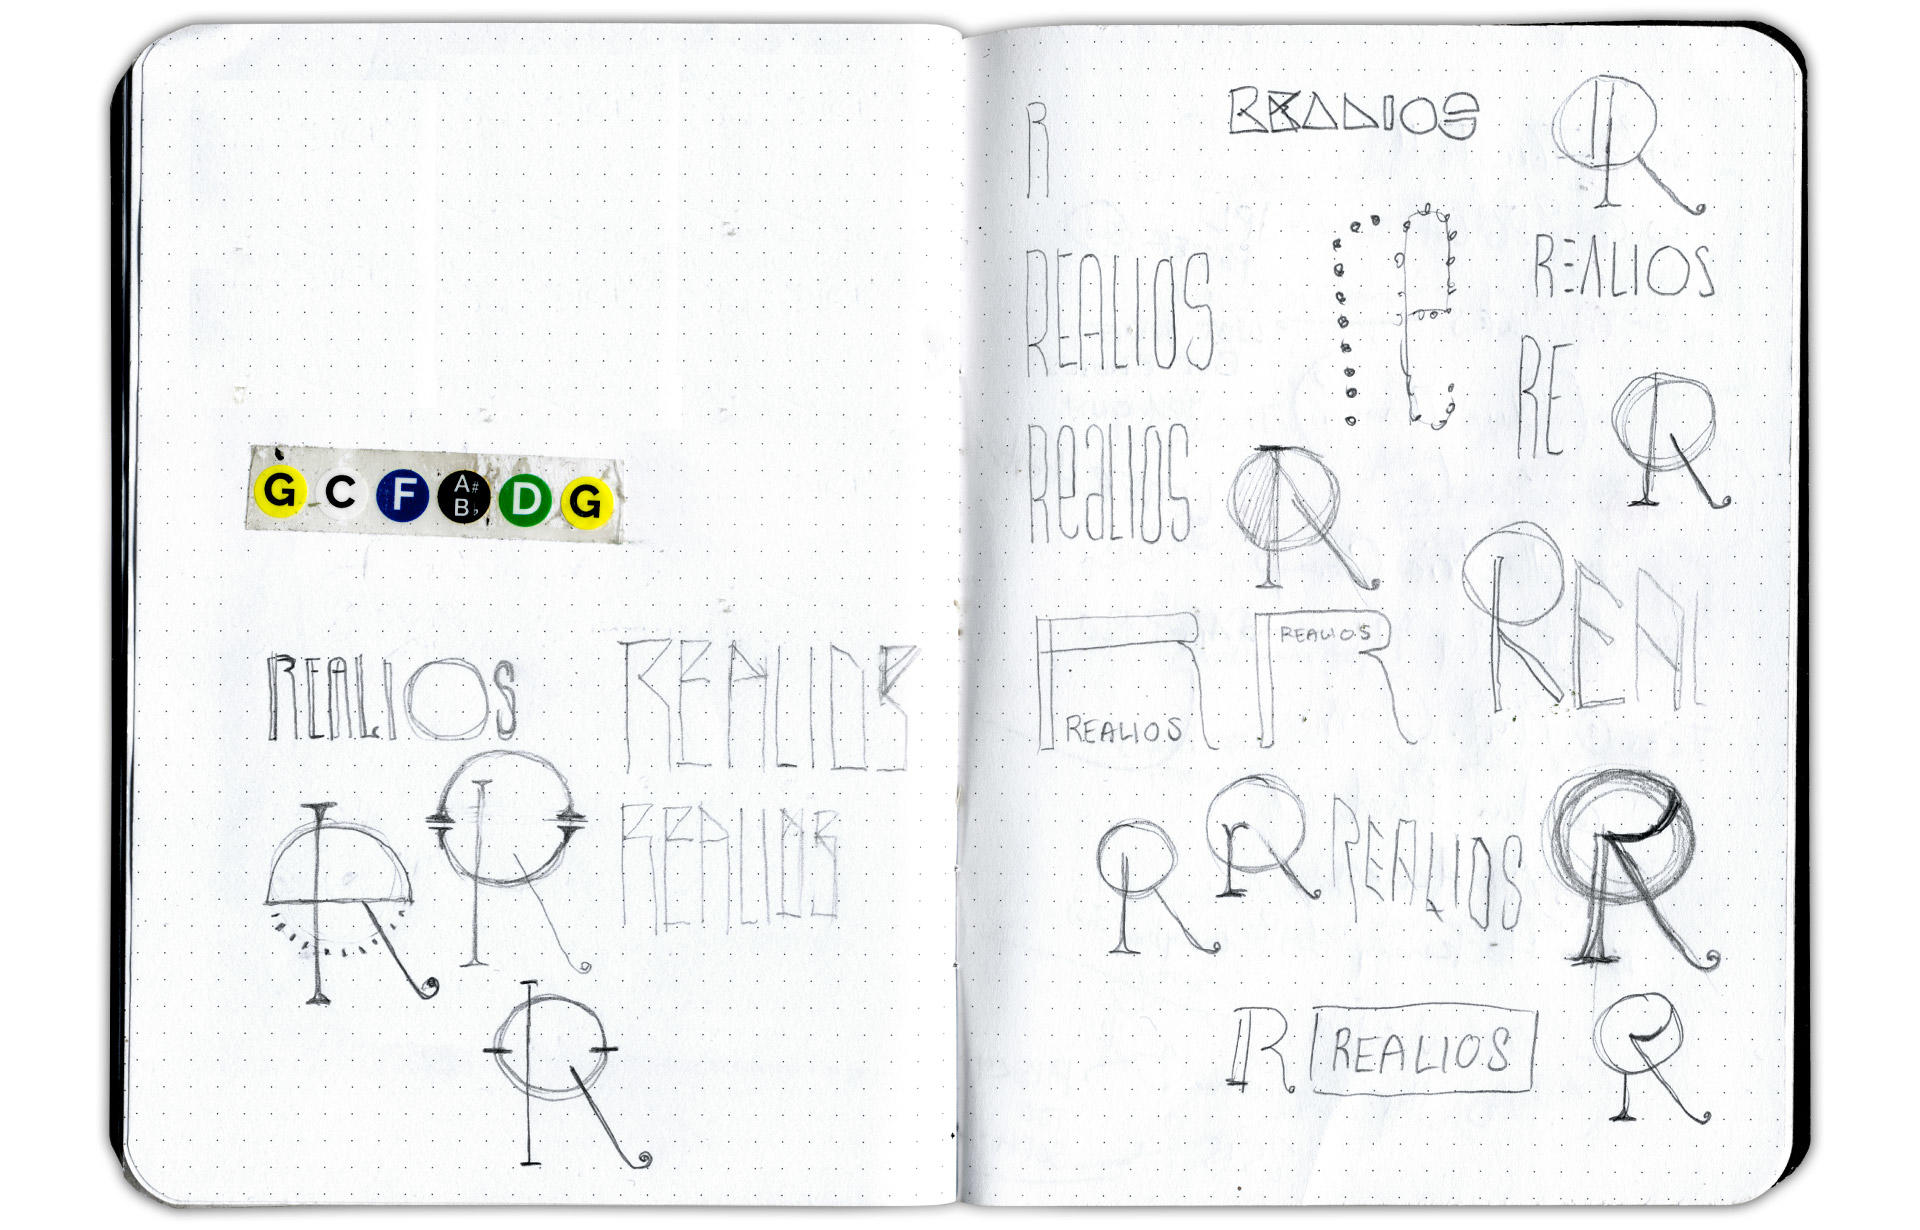 Realios-Sketches@2x.jpg